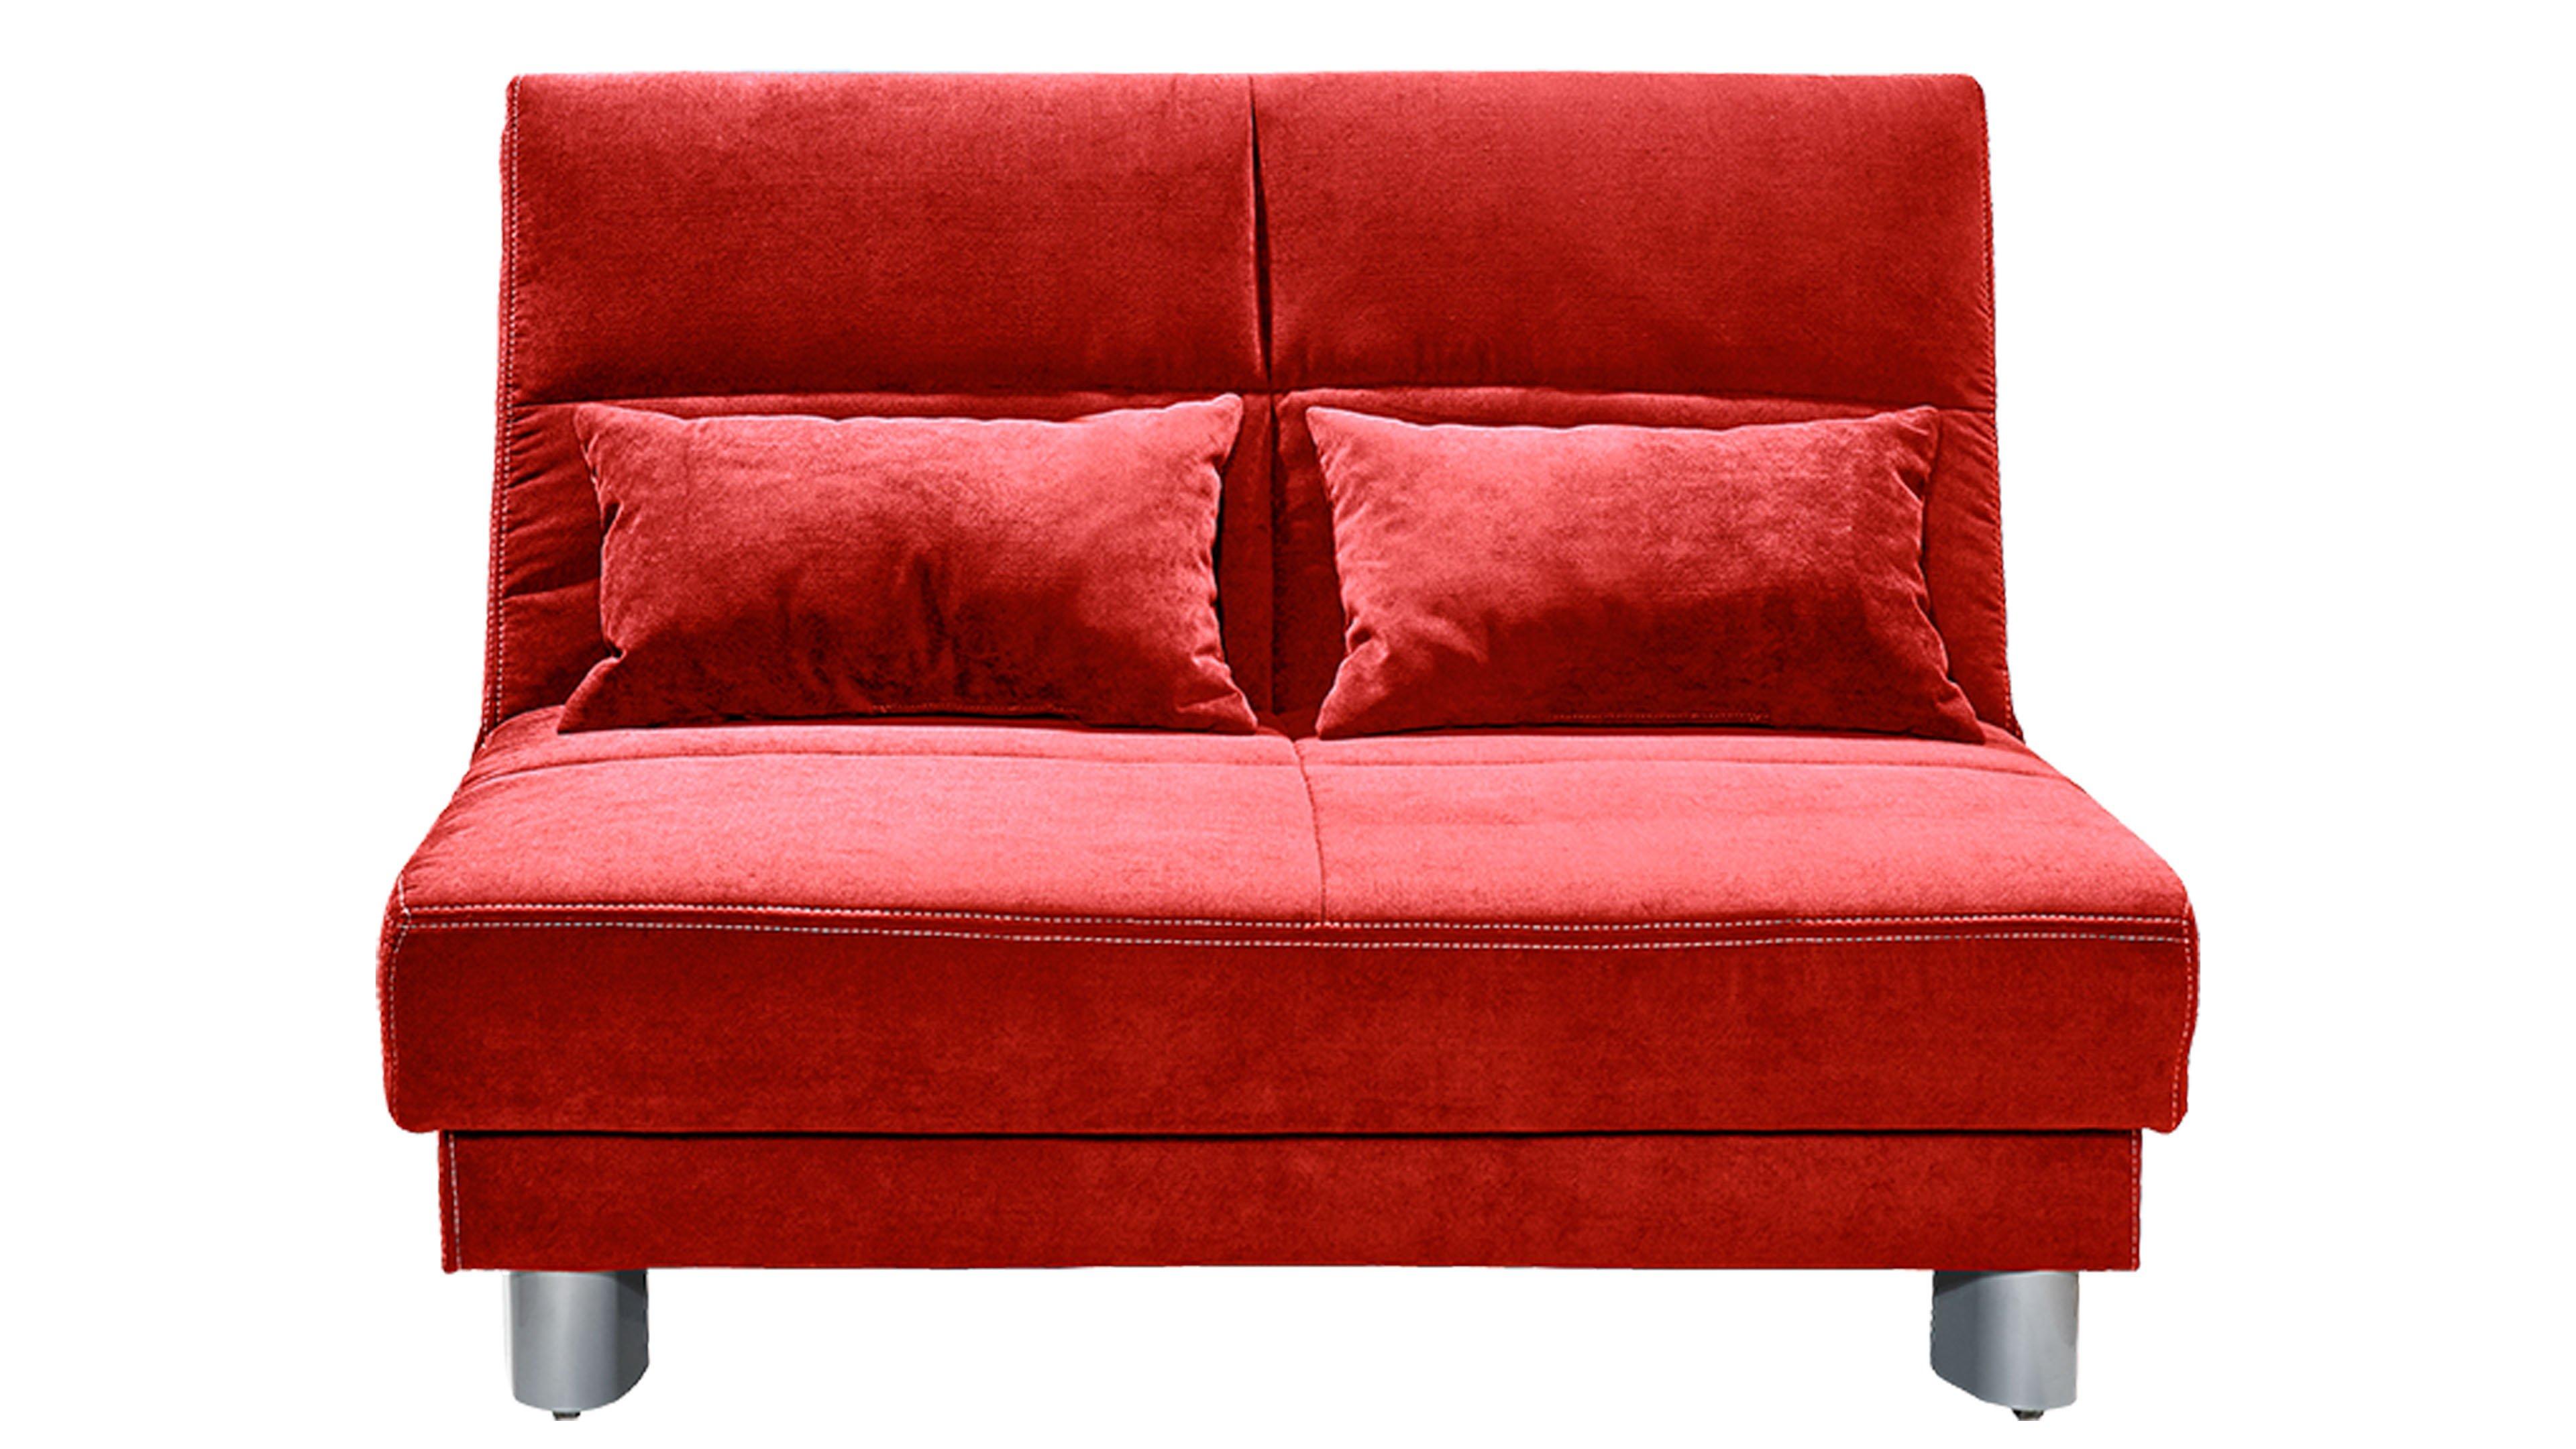 Schlafsofa Gina Bezug Enjoy 14 Rot Füße Metall alufarben